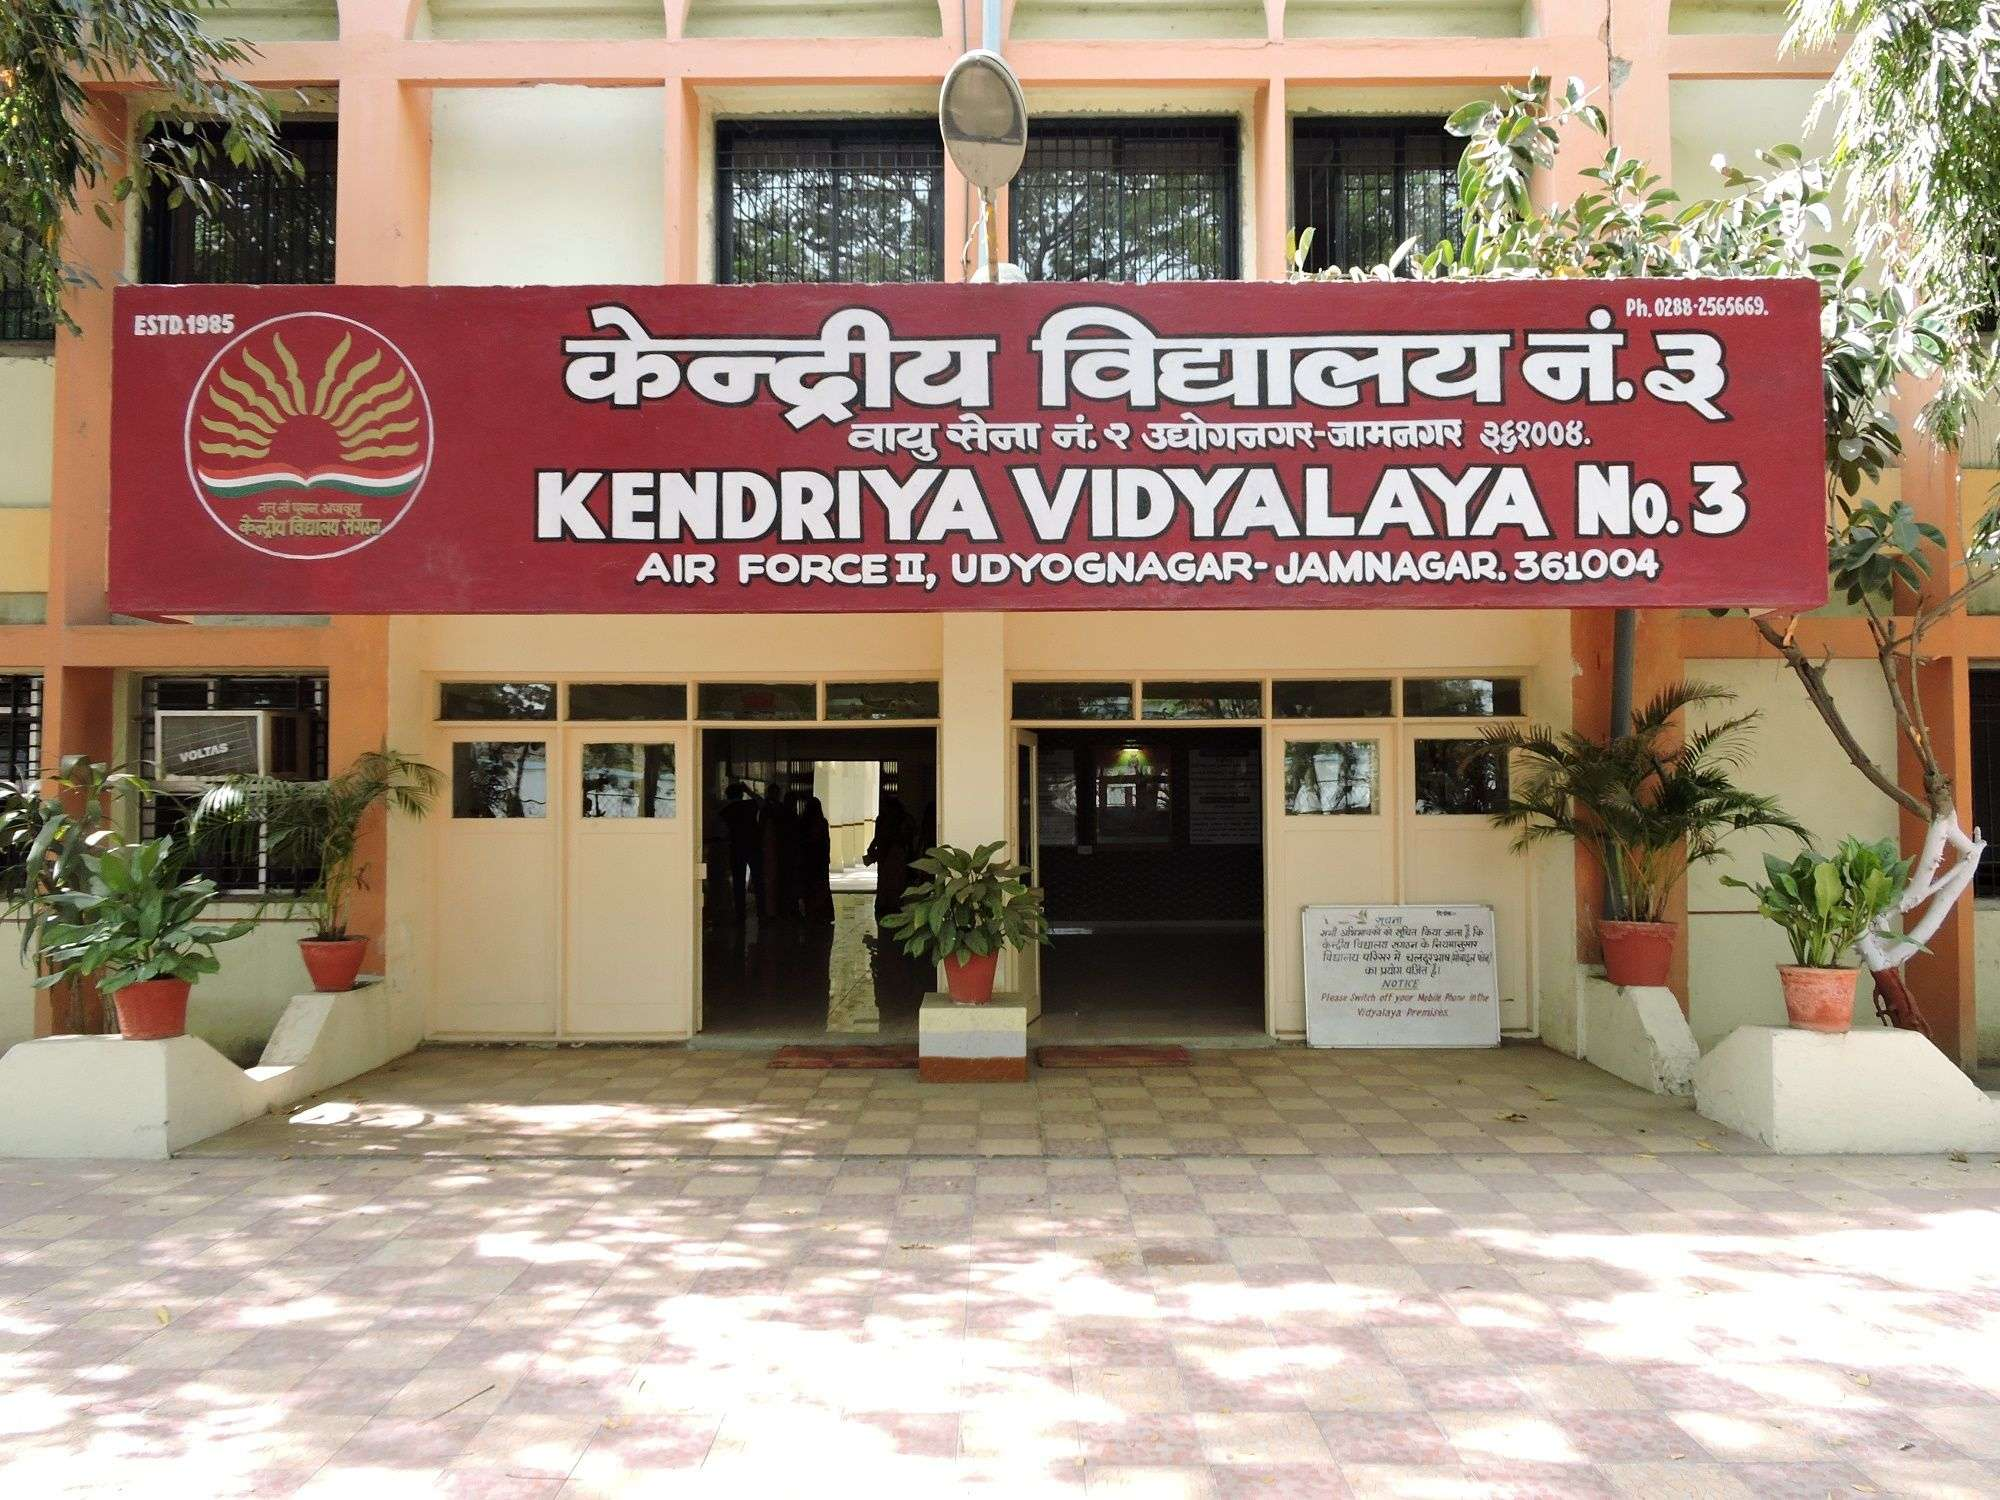 Kendriya Vidyalaya No 3 A F Ii Udyog Nagar 250 Su Jamnagar